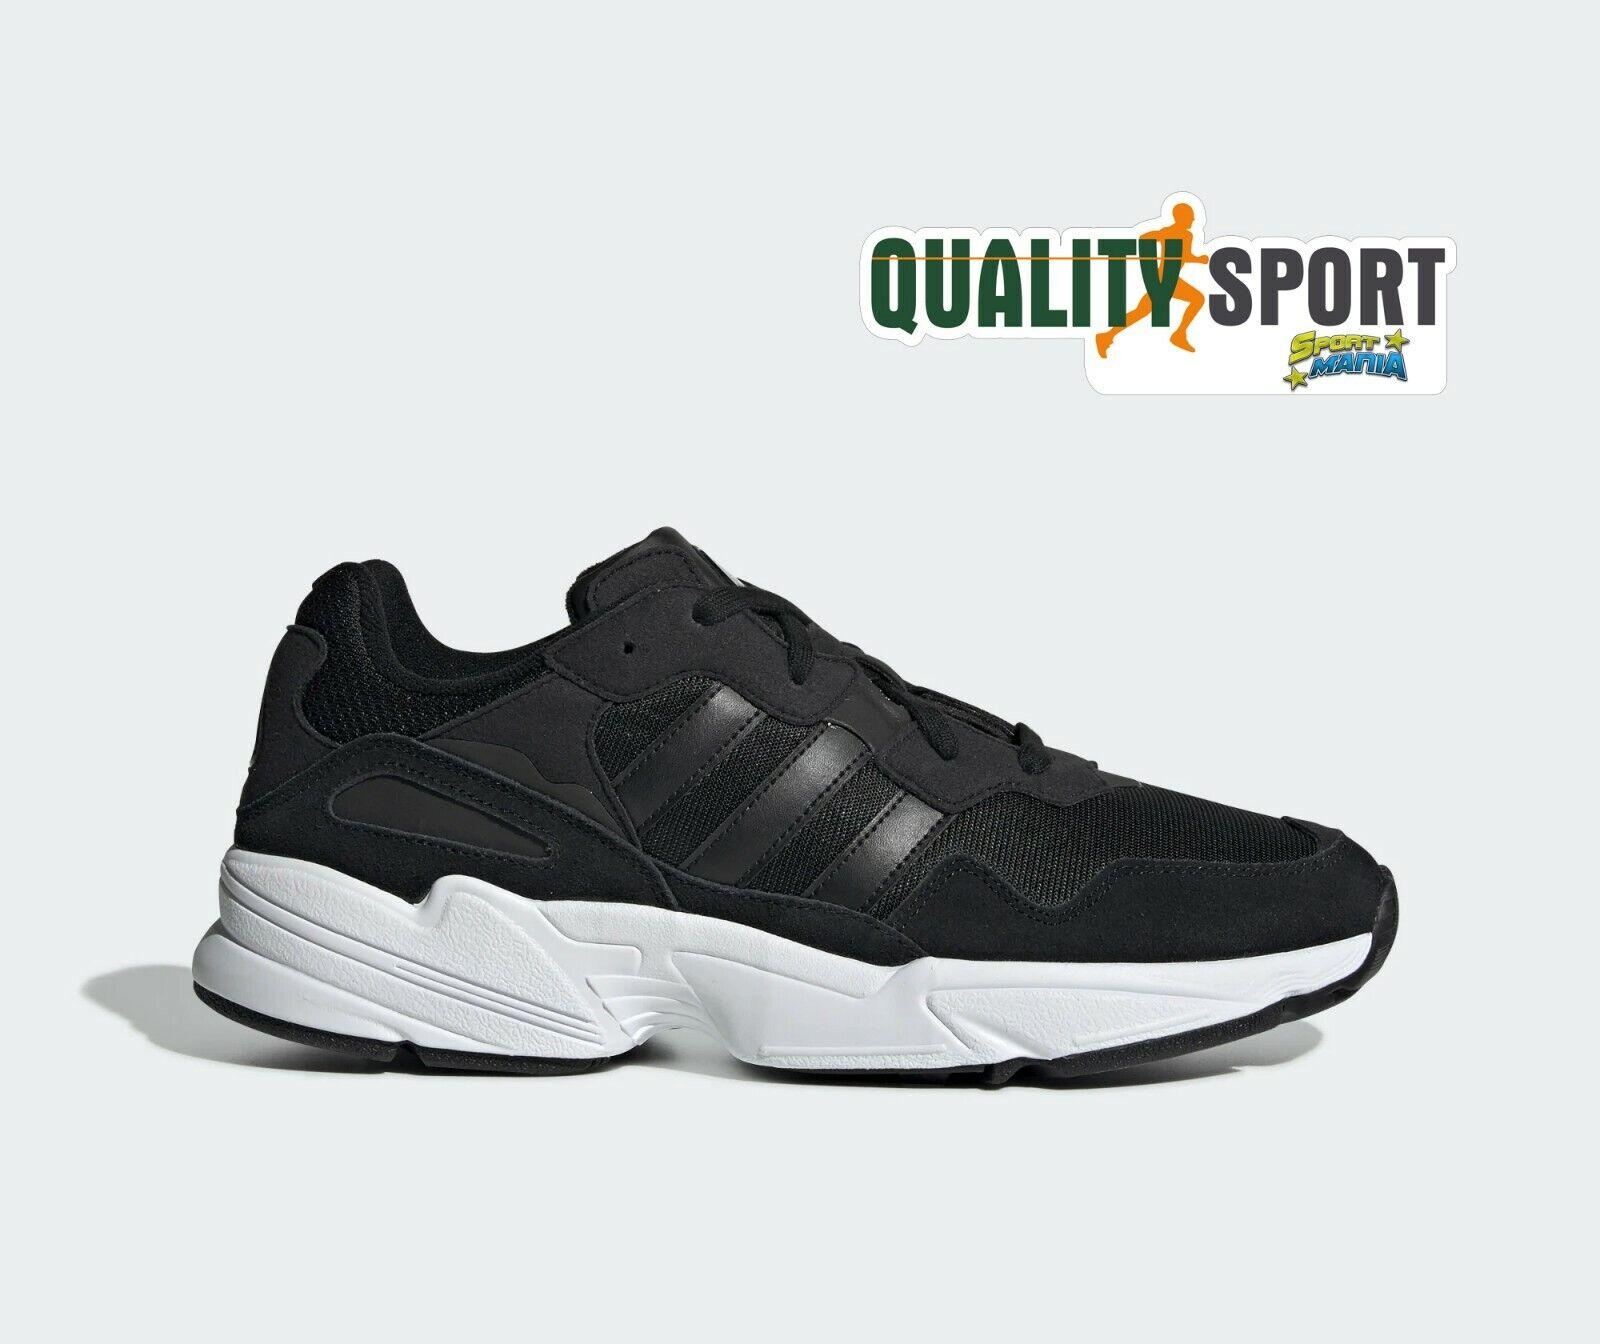 Adidas Yung 96 negro zapatos zapatos hombres Sportive zapatillas EE3681 2019